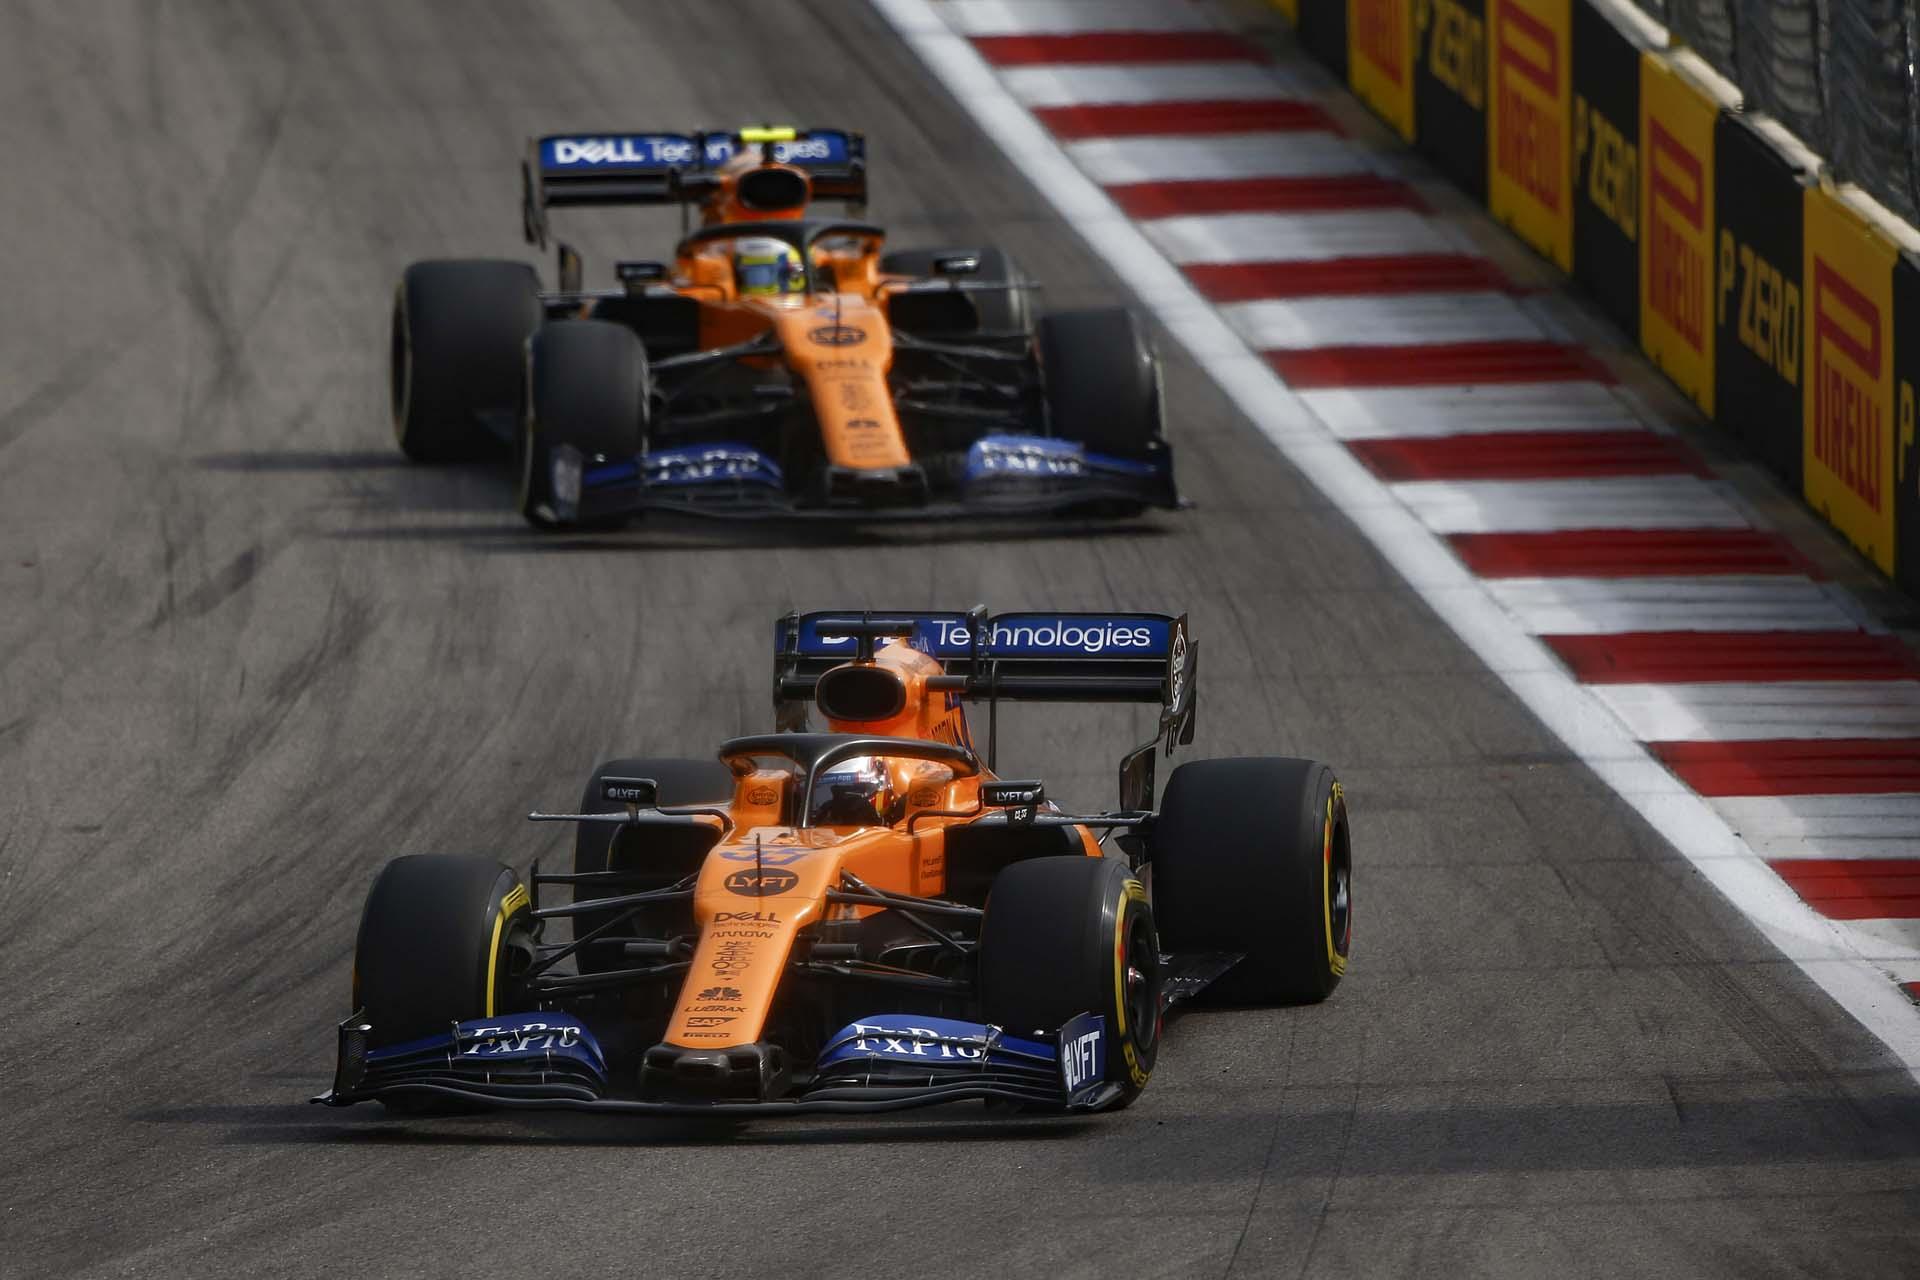 Carlos Sainz, McLaren MCL34, leads Lando Norris, McLaren MCL34